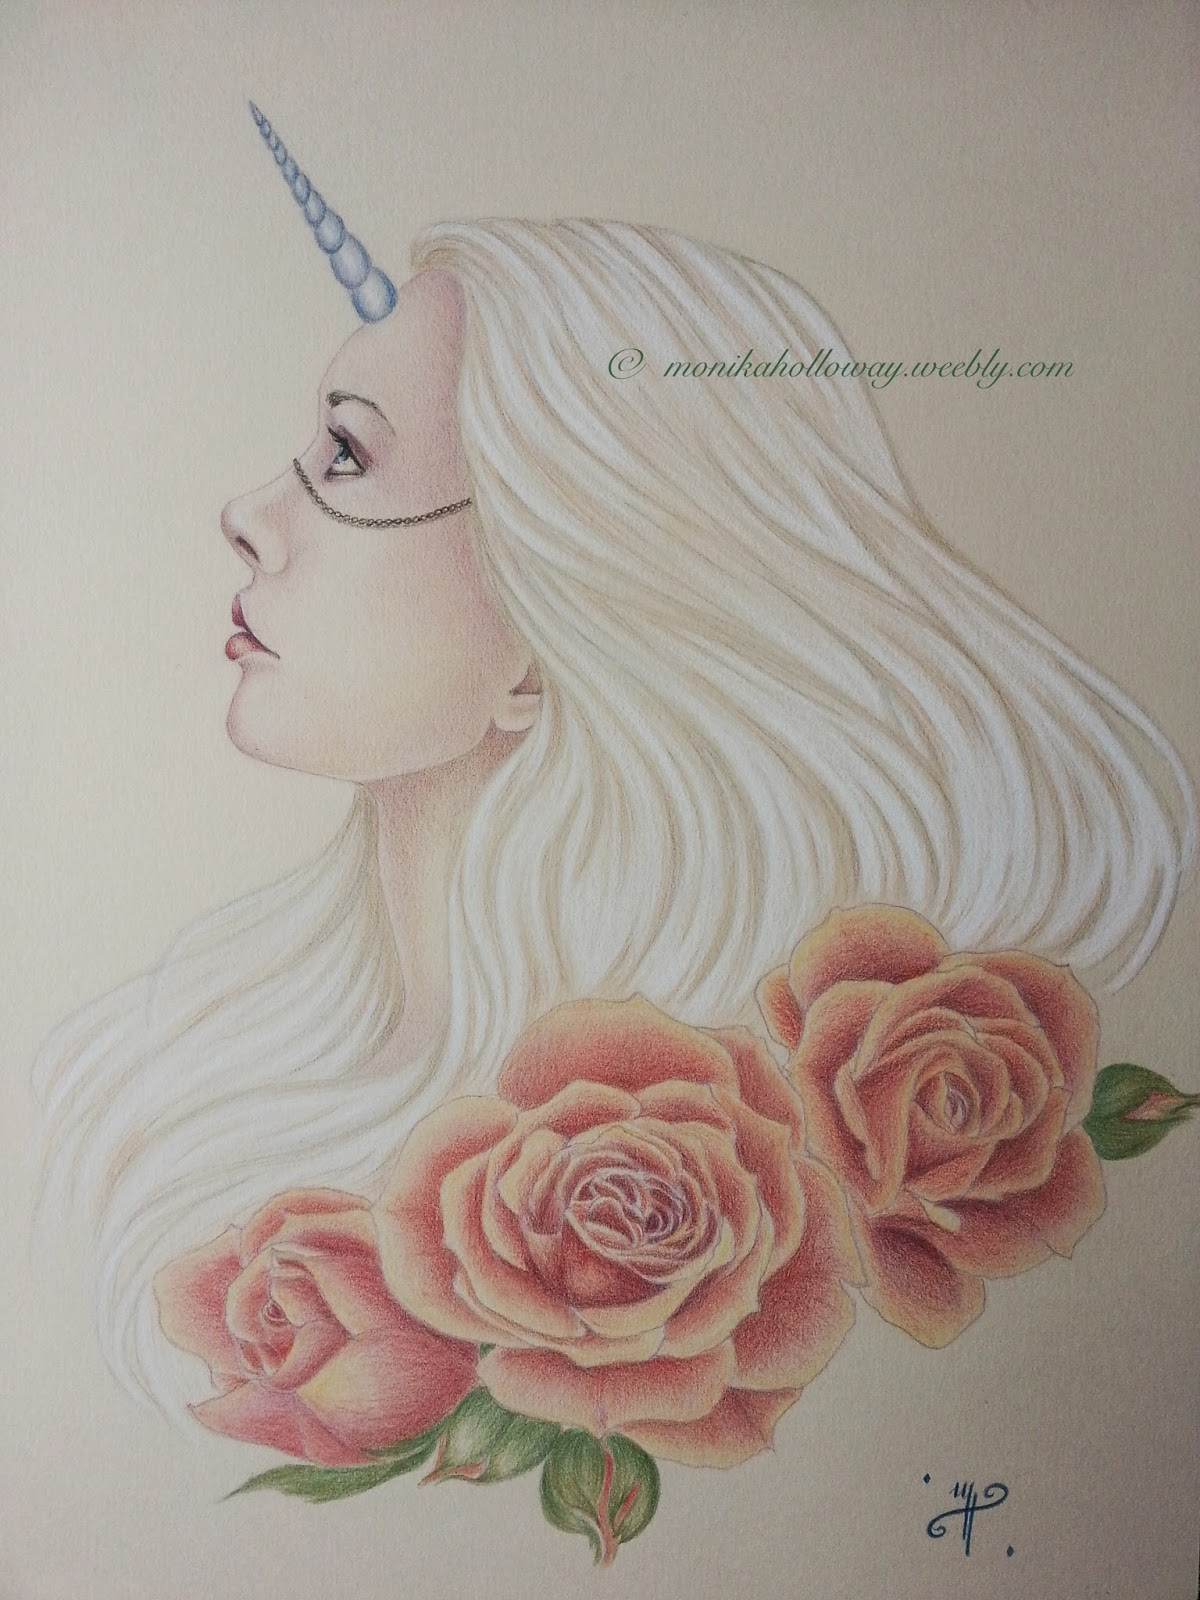 Frustration by Enchanted Visions Artist Monika Holloway